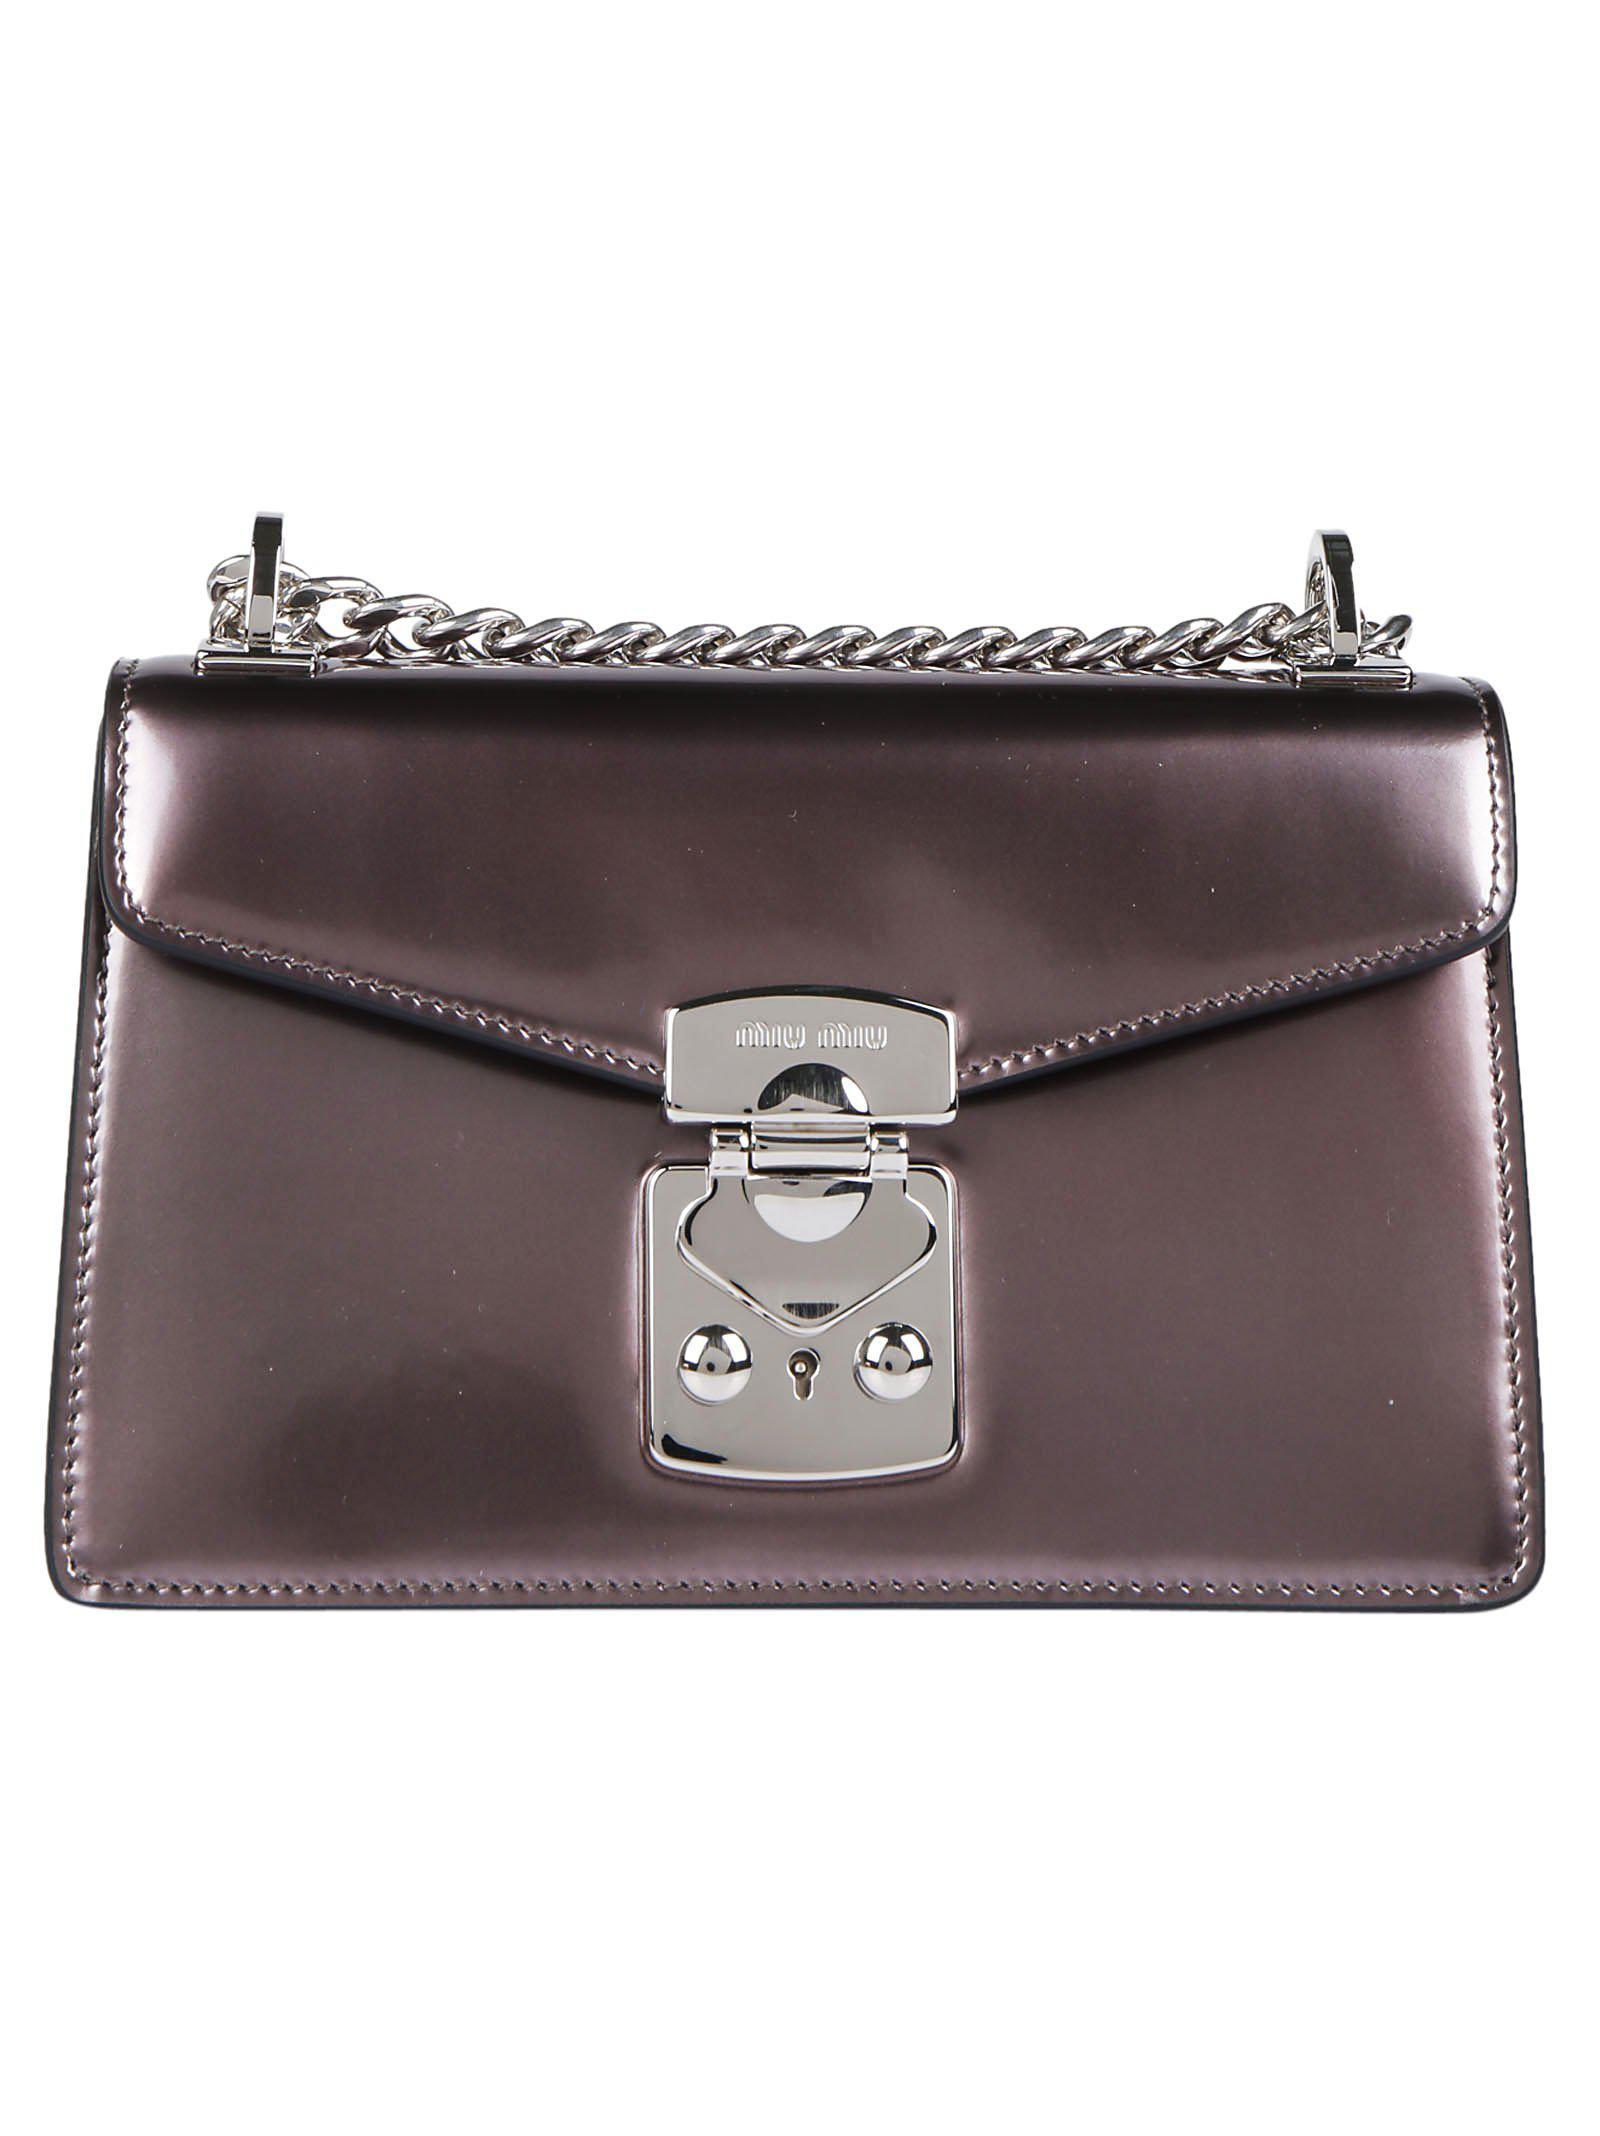 Lyst - Miu Miu Metallic Chain Strap Shoulder Bag in Gray 9b04d7bba1